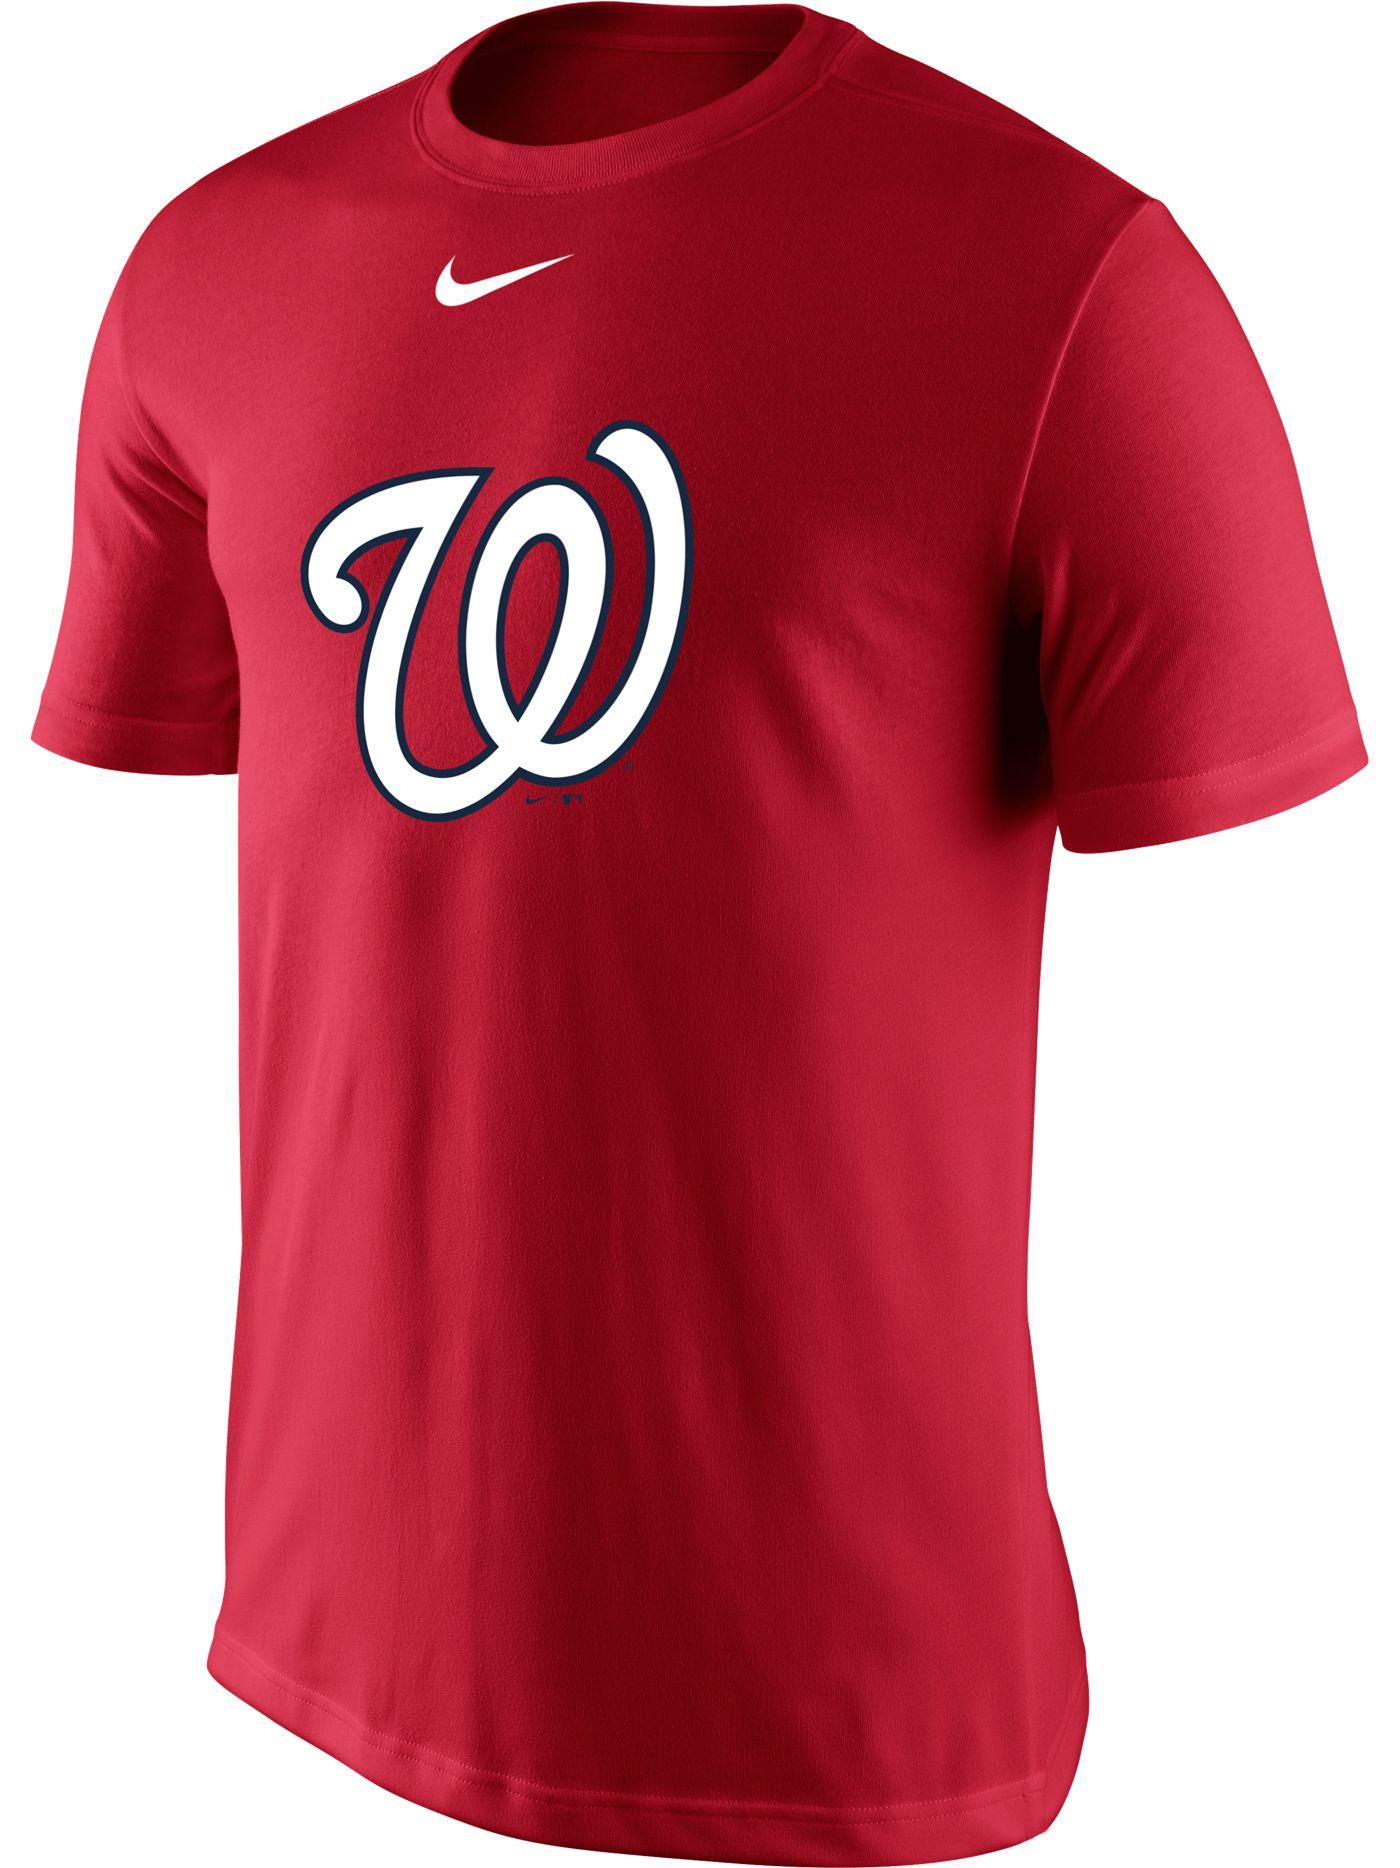 Nike Men's Washington Nationals Dri-FIT Legend T-Shirt